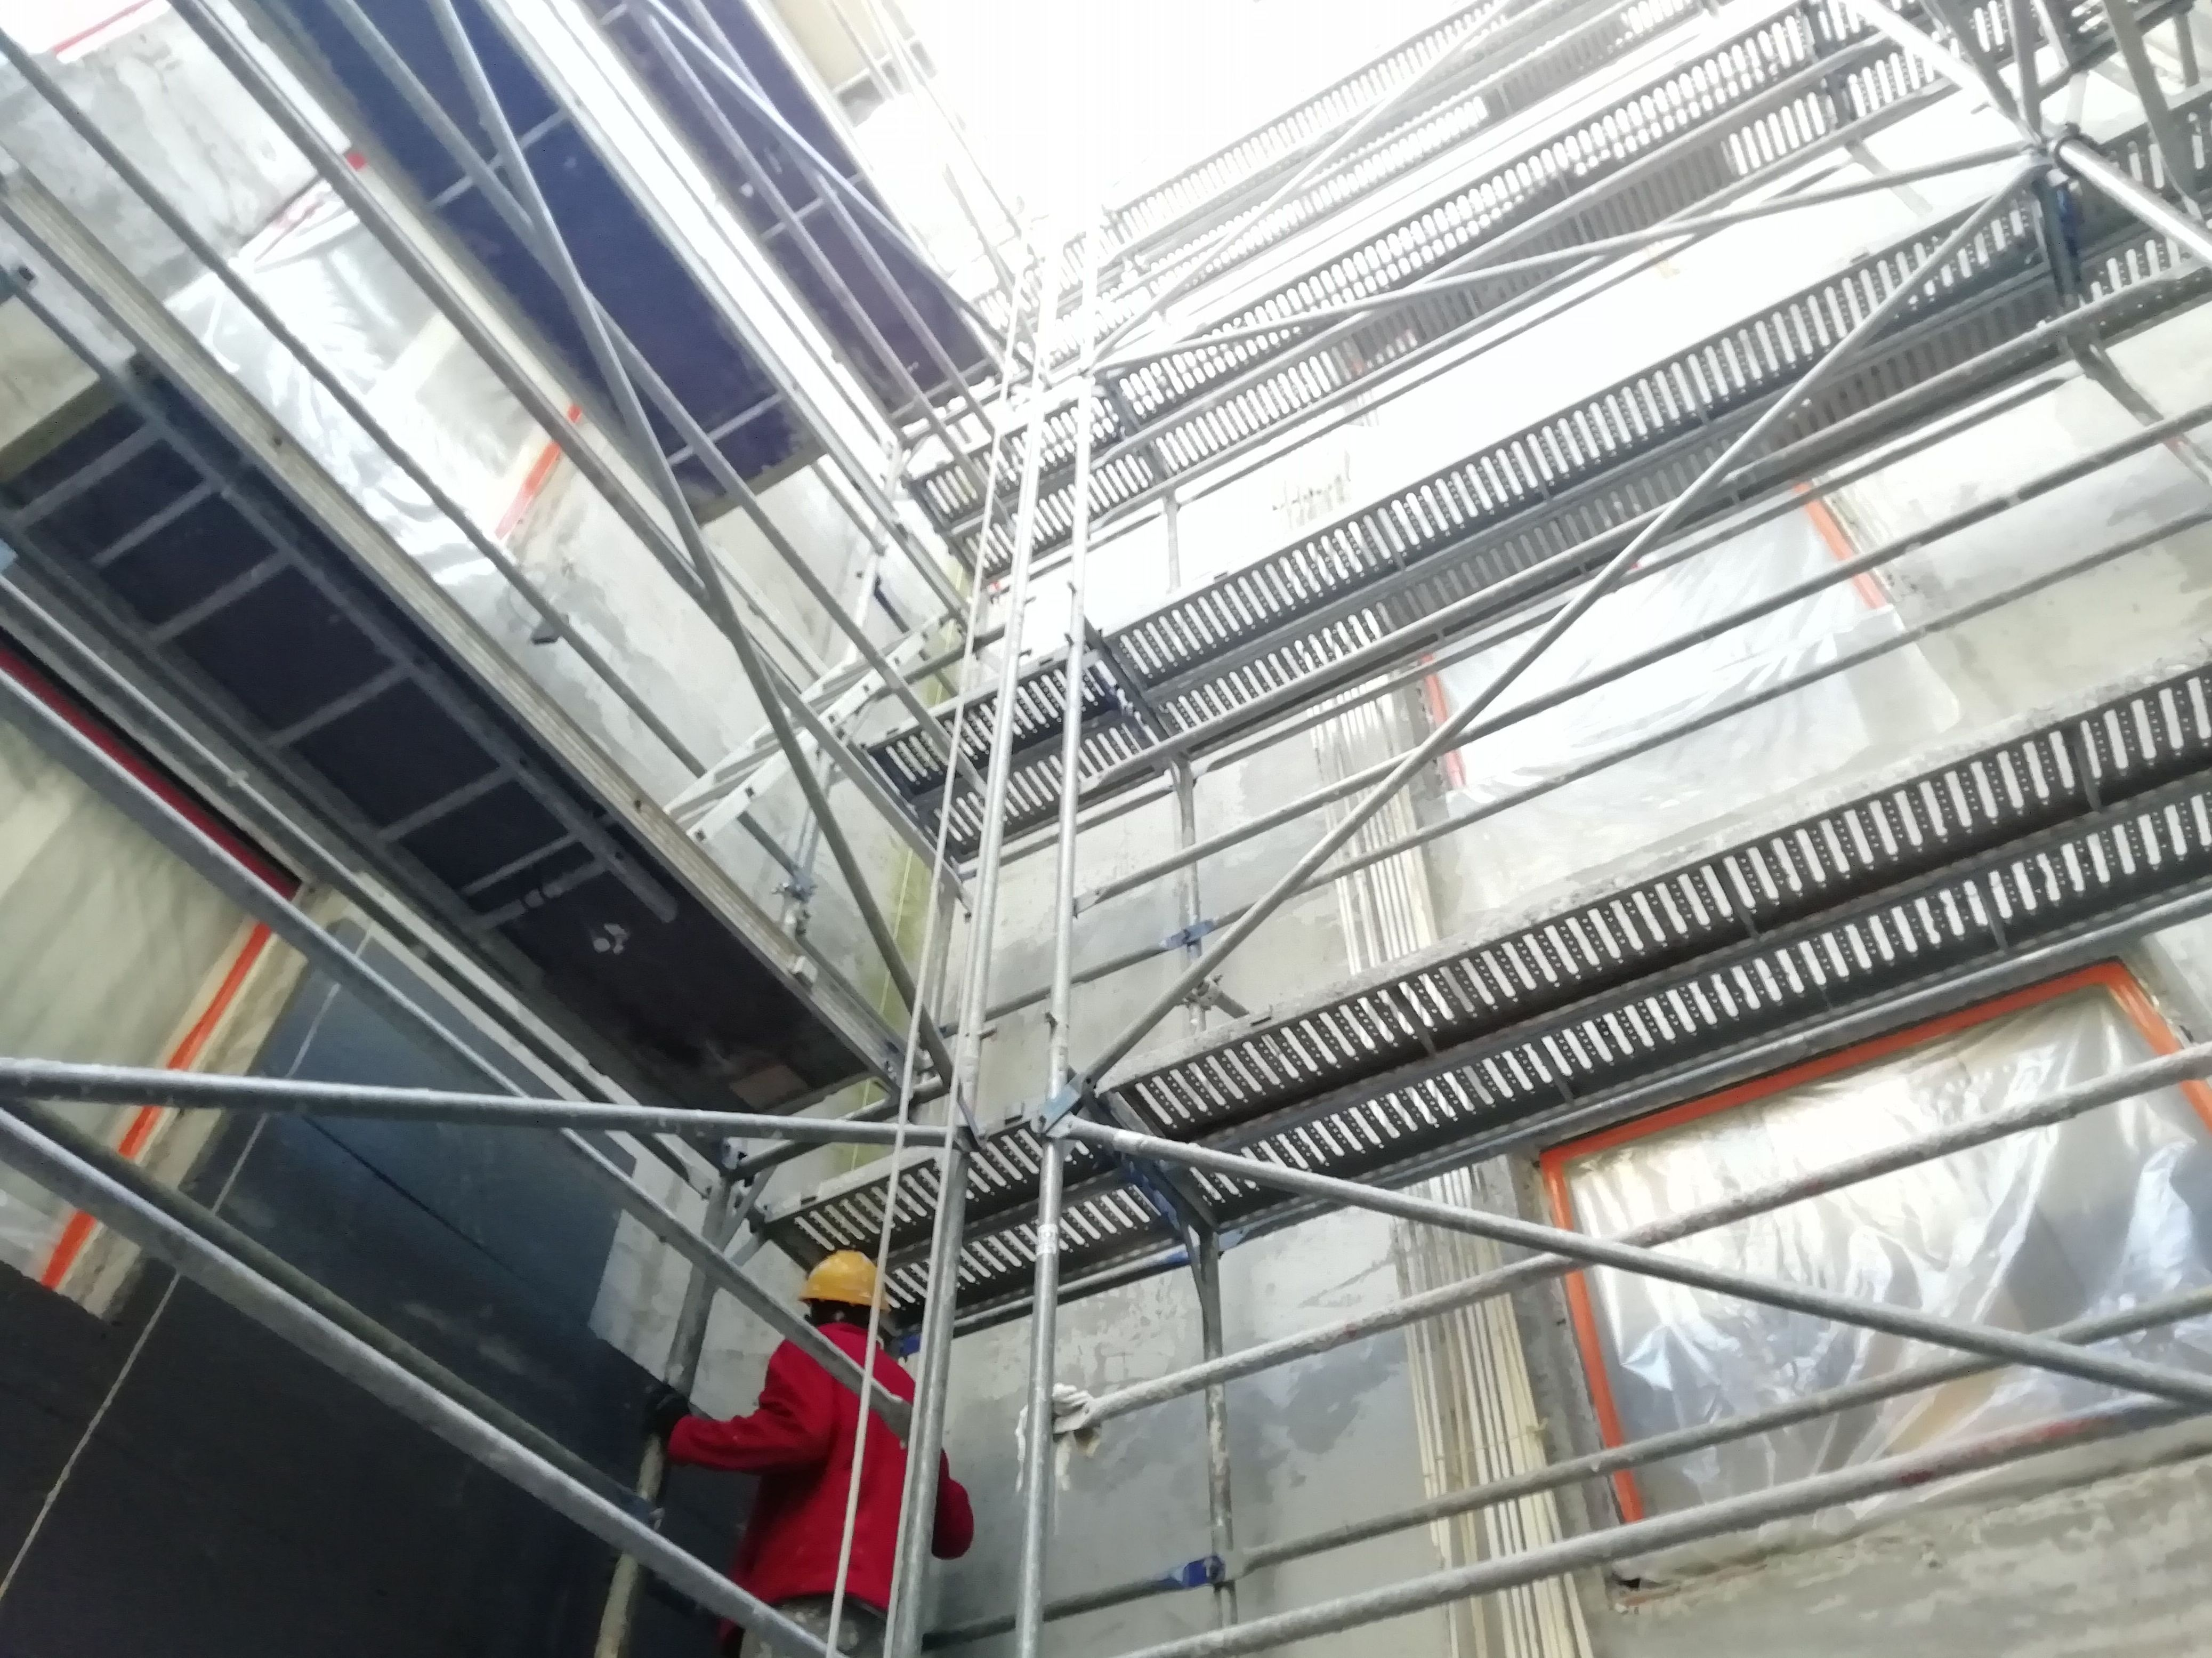 Foto 2 de Arquitectos en Getxo | Gabinete de Arquitectura Técnica: José Andrés Roa Corcuera